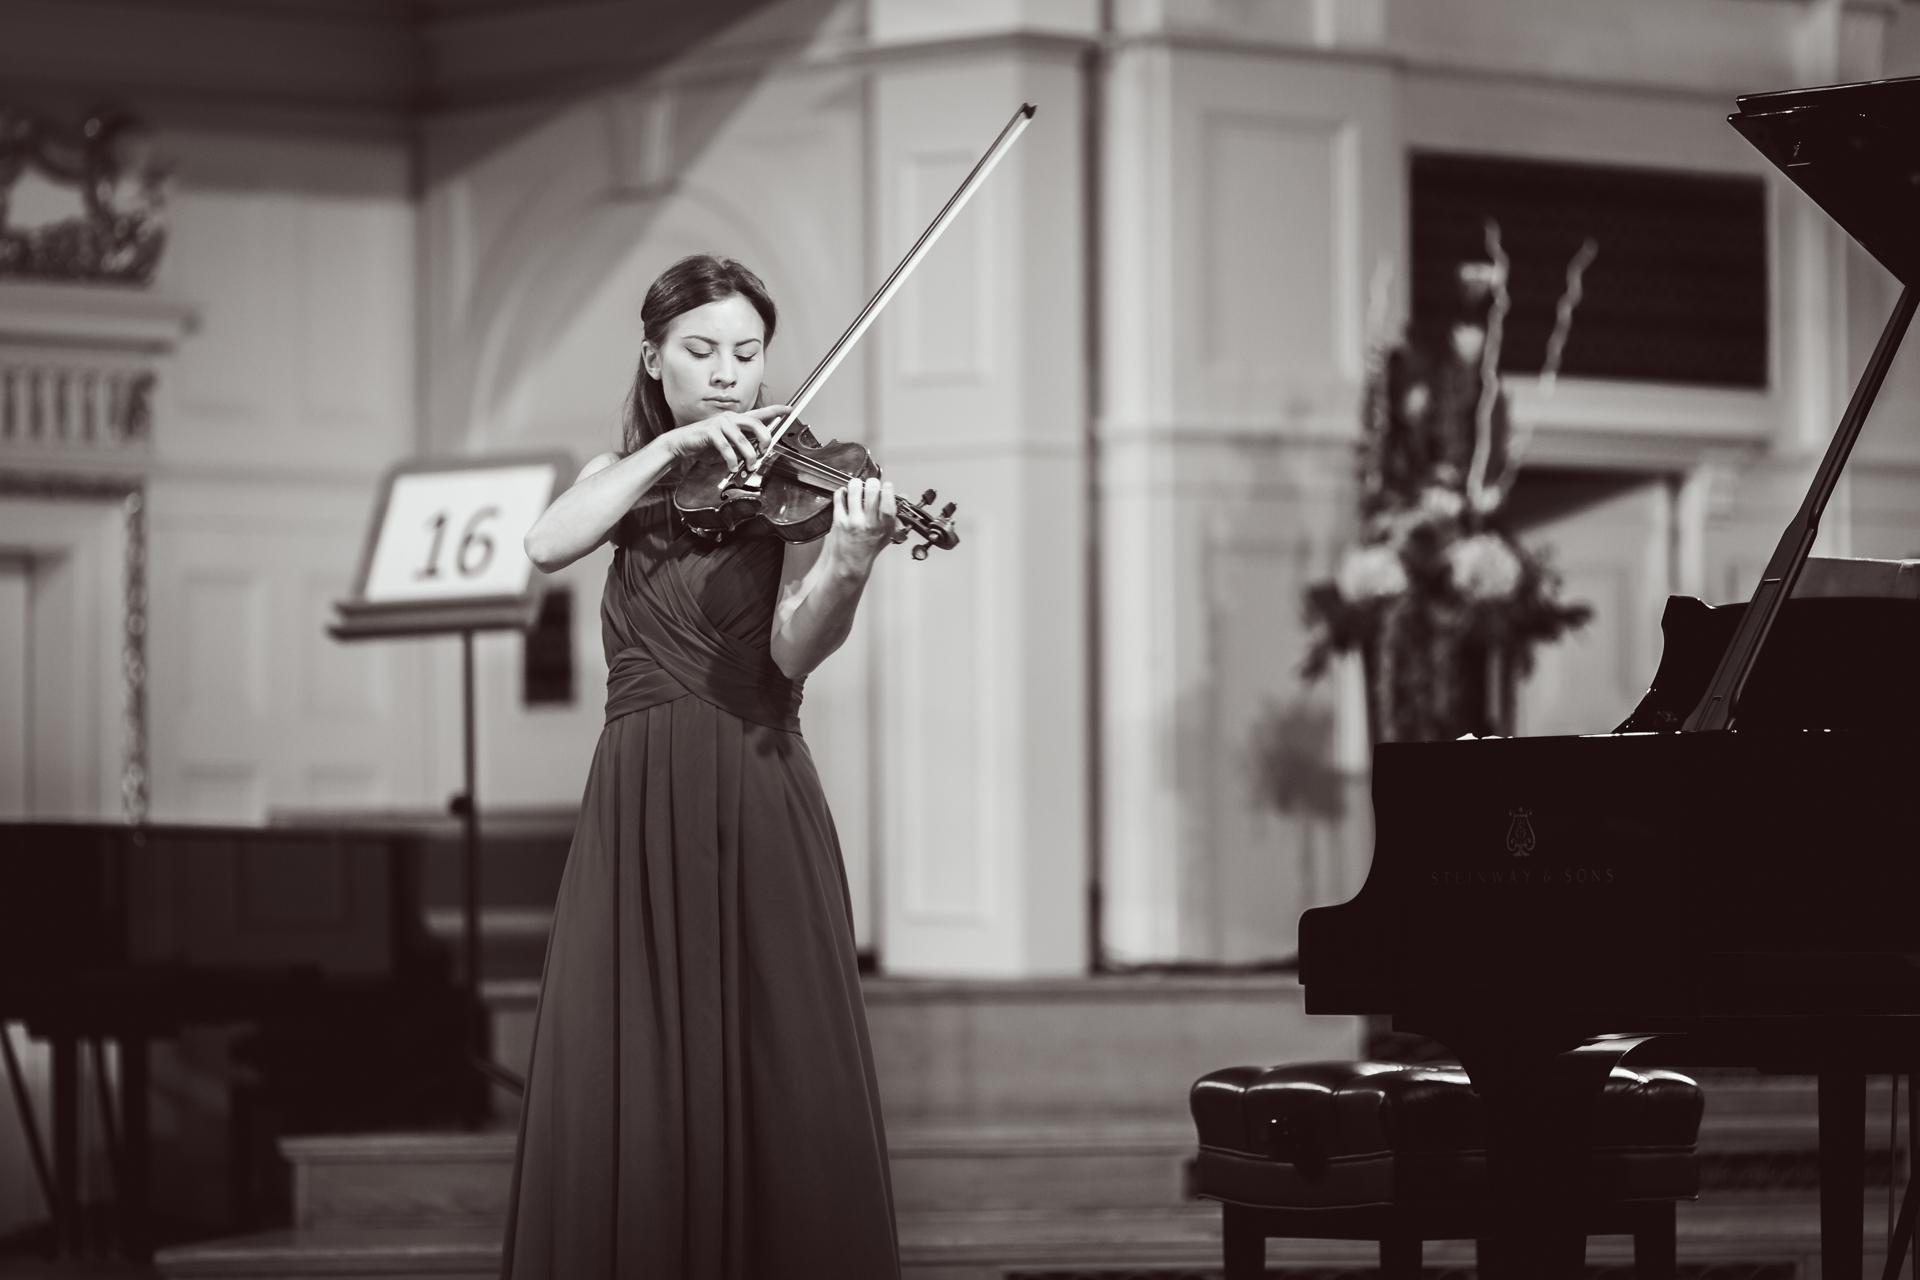 Celina Kotz (Poland) - Stage 1 - 15th International H. Wieniawski Violin Competition BINAURAL | use headphones